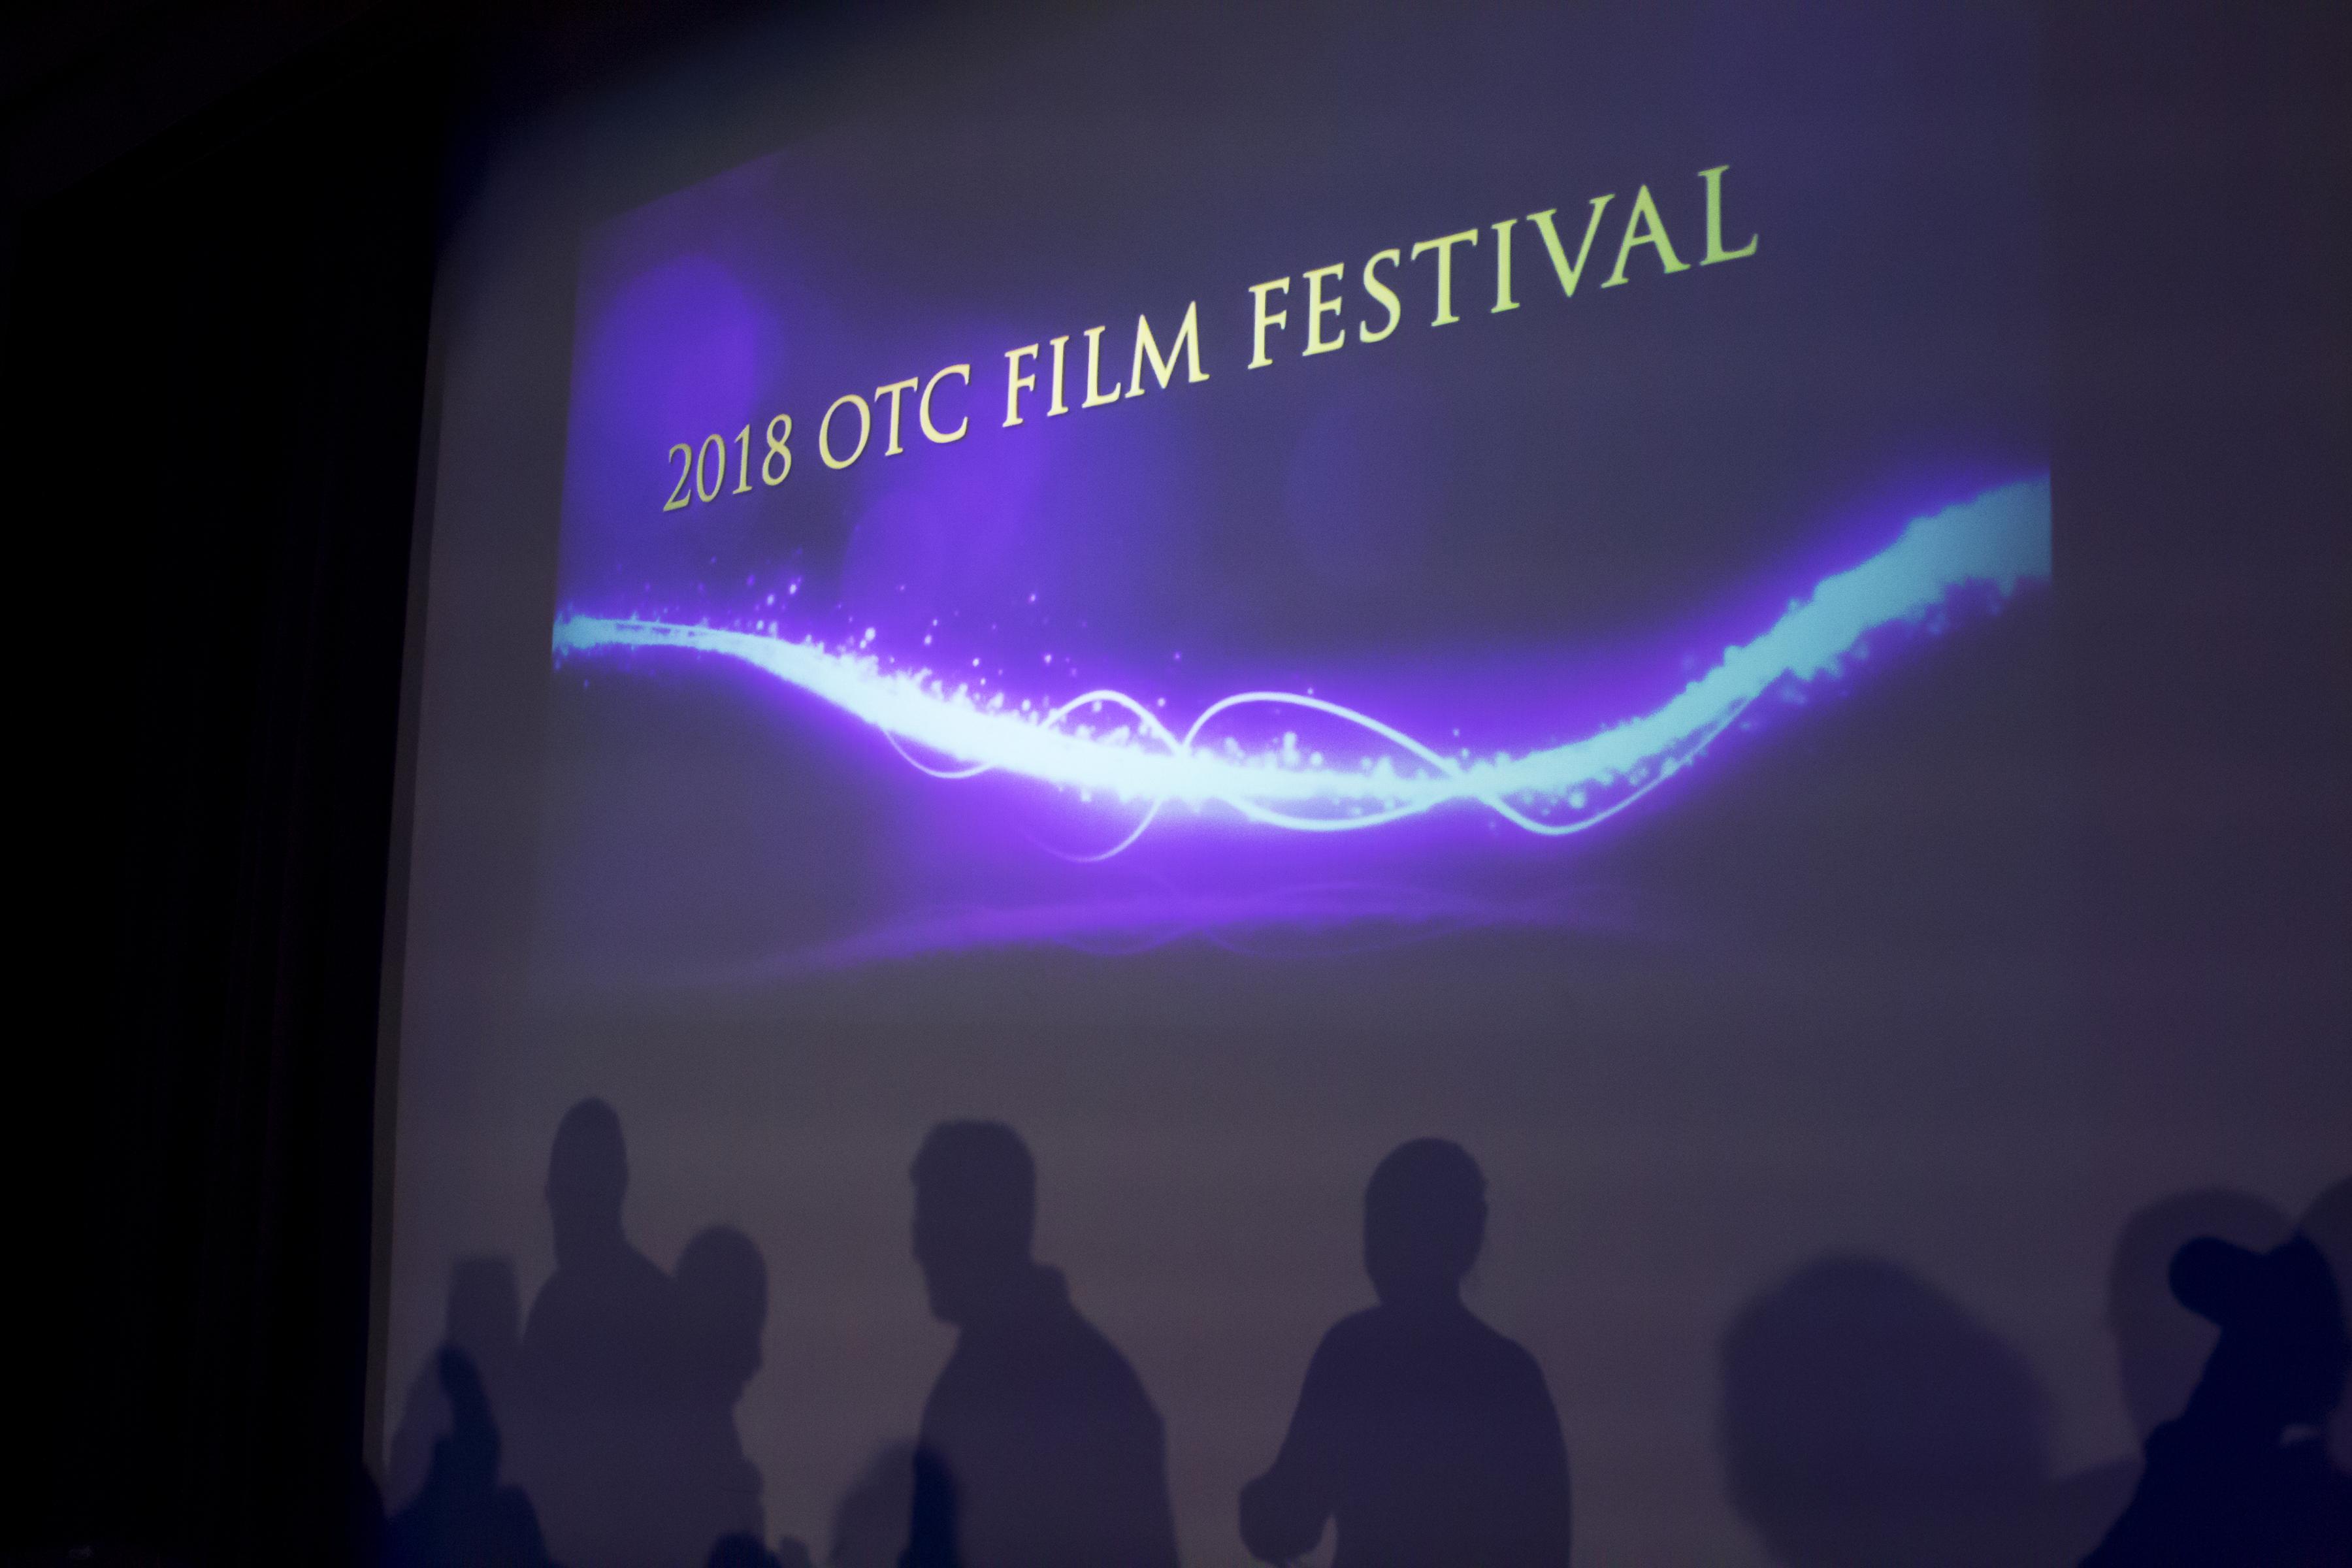 Film Festival Sp18 _ 02